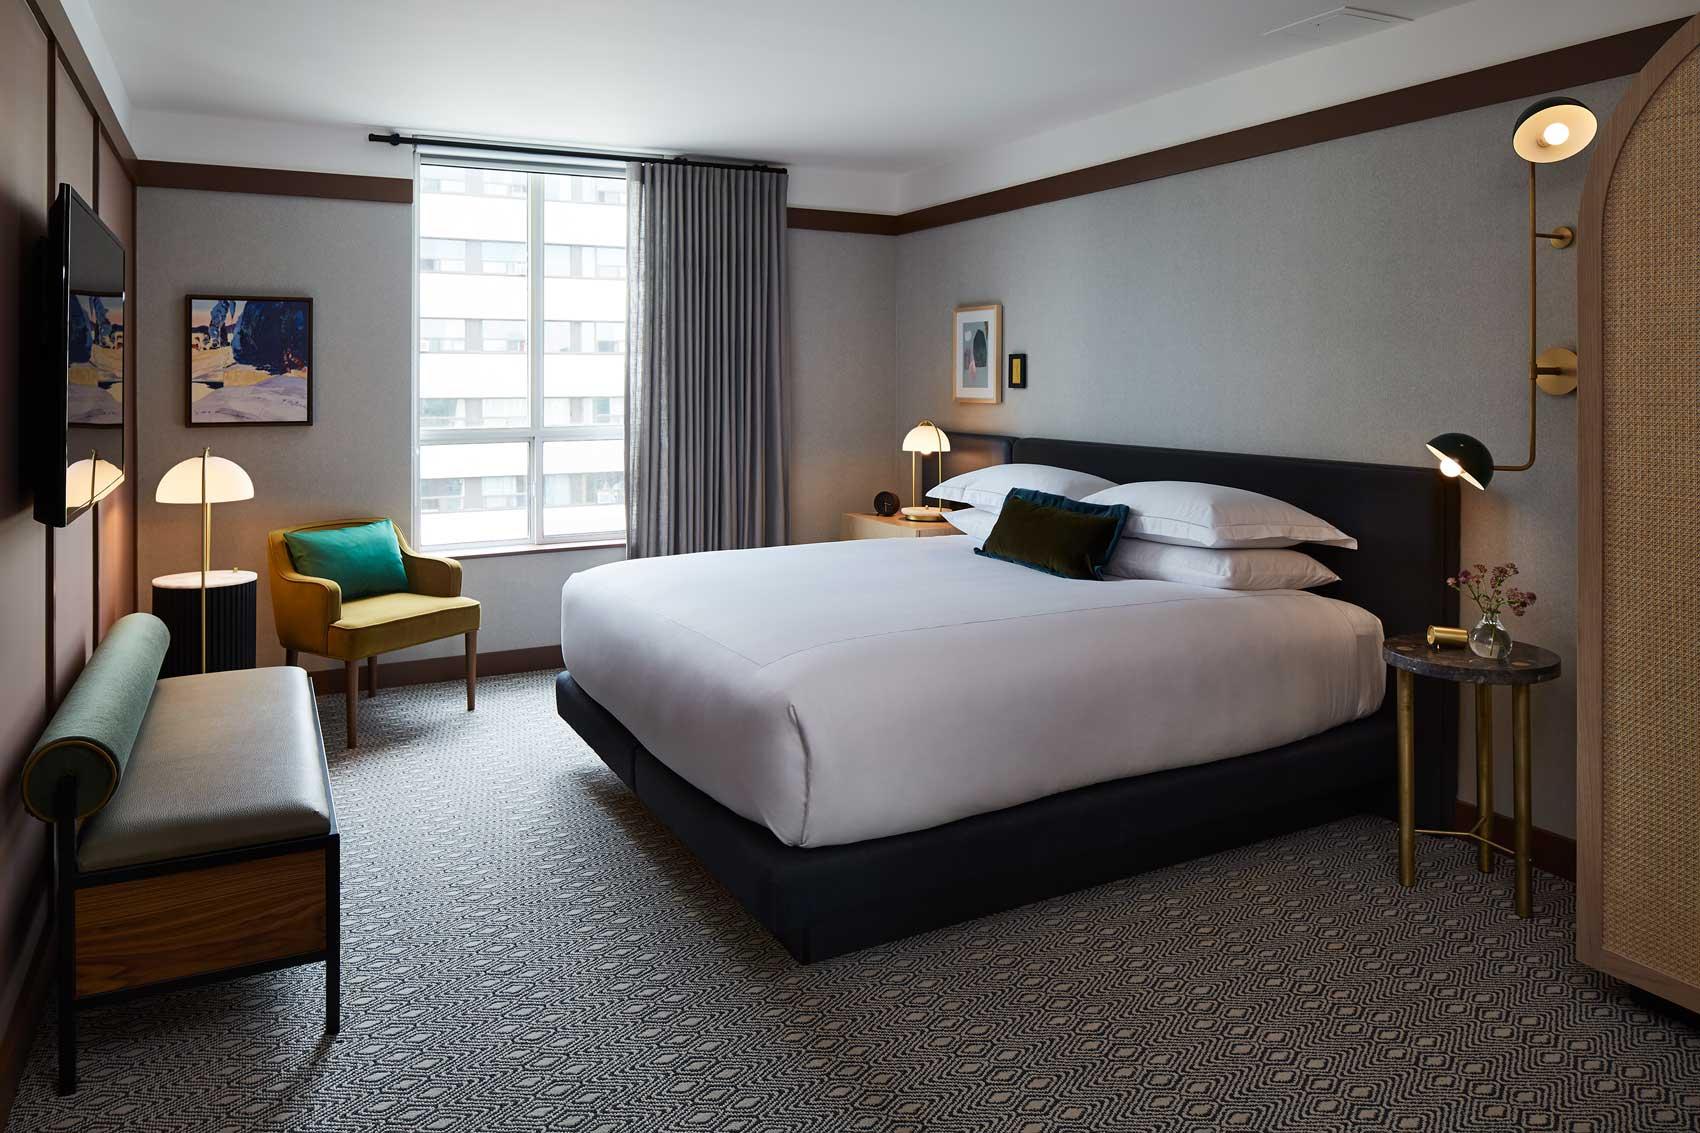 Bringing Home to Hotel Design at the Kimpton Saint George Hotel